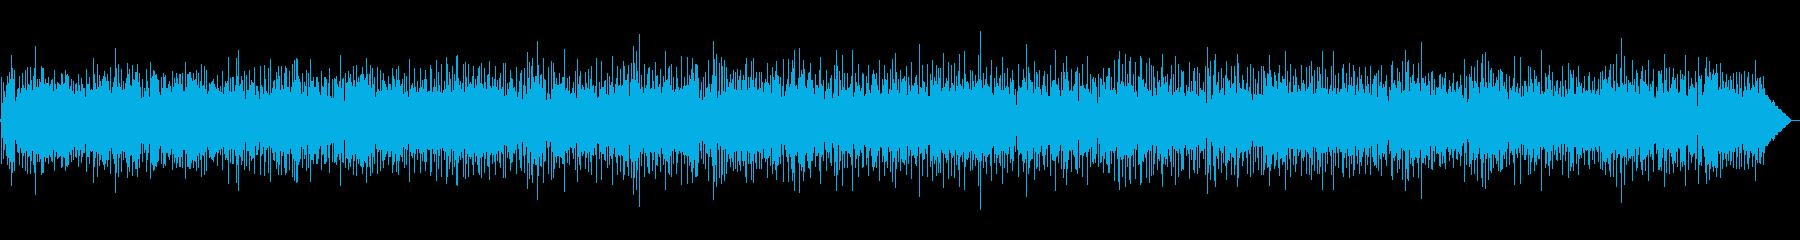 BGM|盛り上がる!超絶かっこいいロックの再生済みの波形